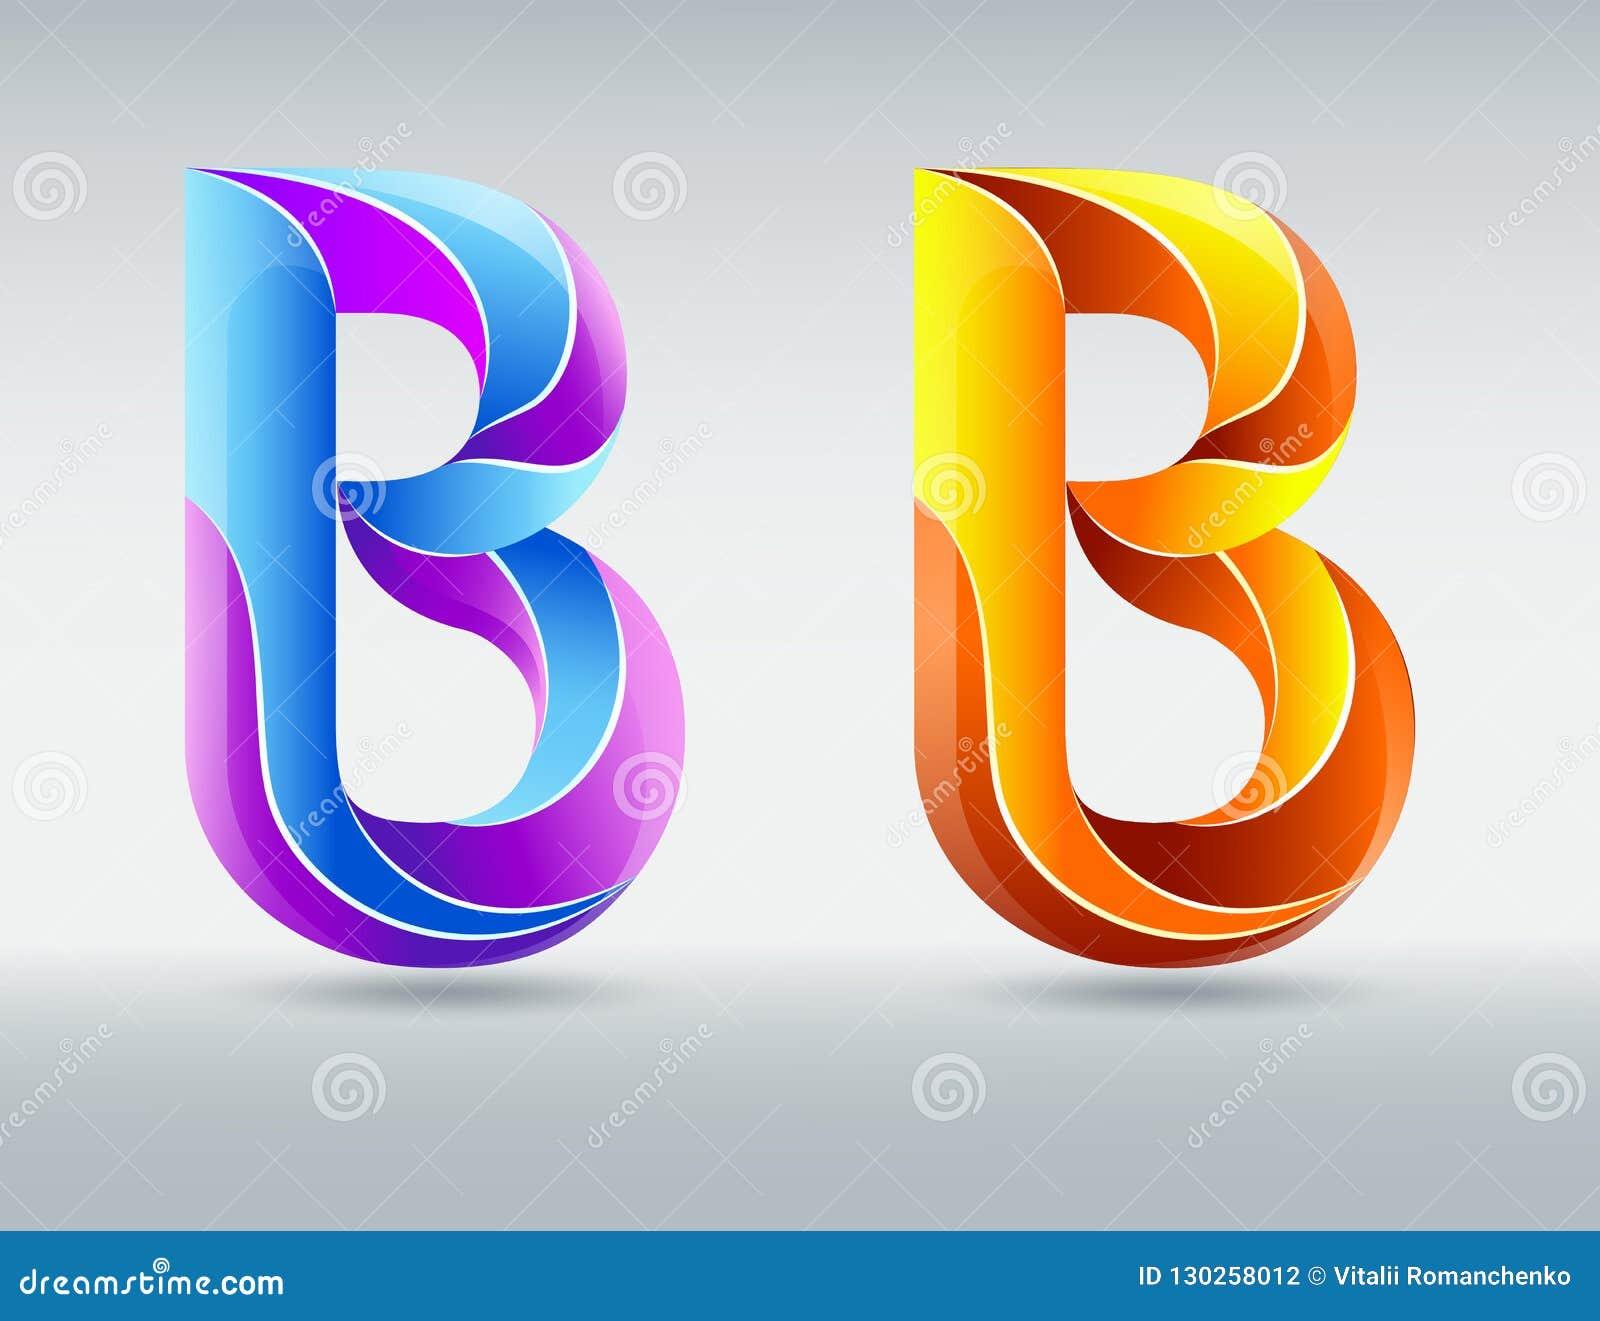 Fonti Di Logo Lettera B Di Vettore Fonte Torta Creativa 3D